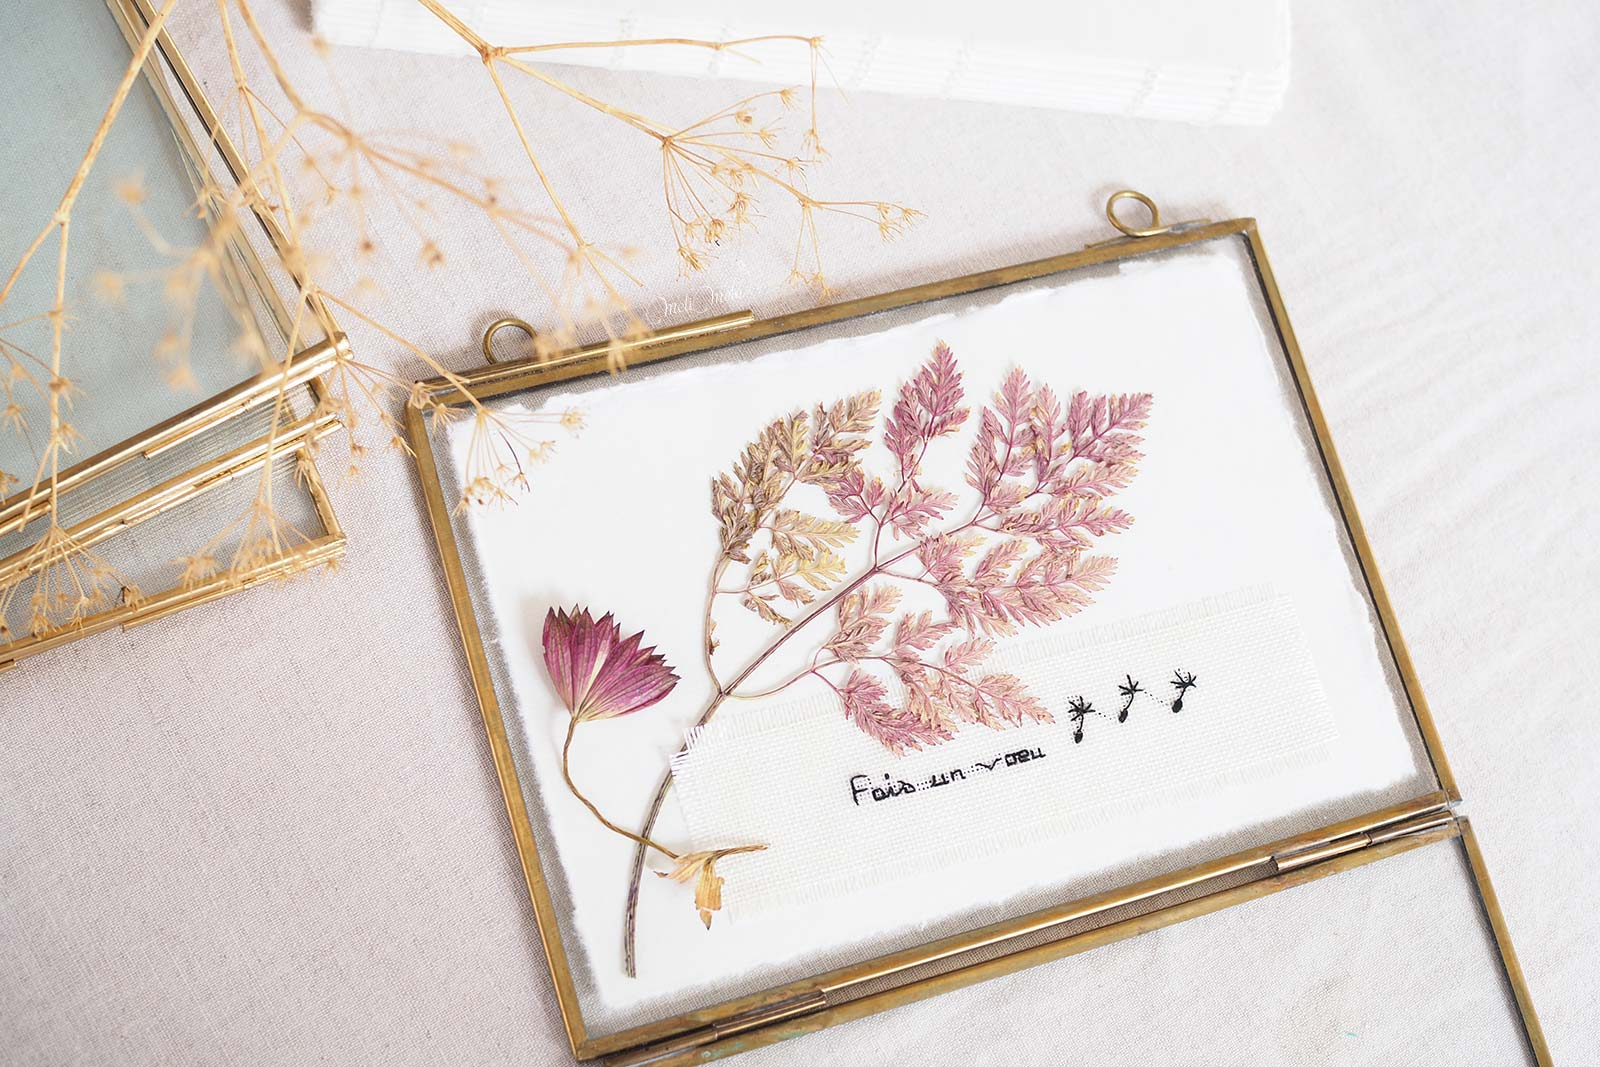 cadre-vegetal-herbier-fleur-astrance-feuillage-pourpre-laboutiquedemelimelo